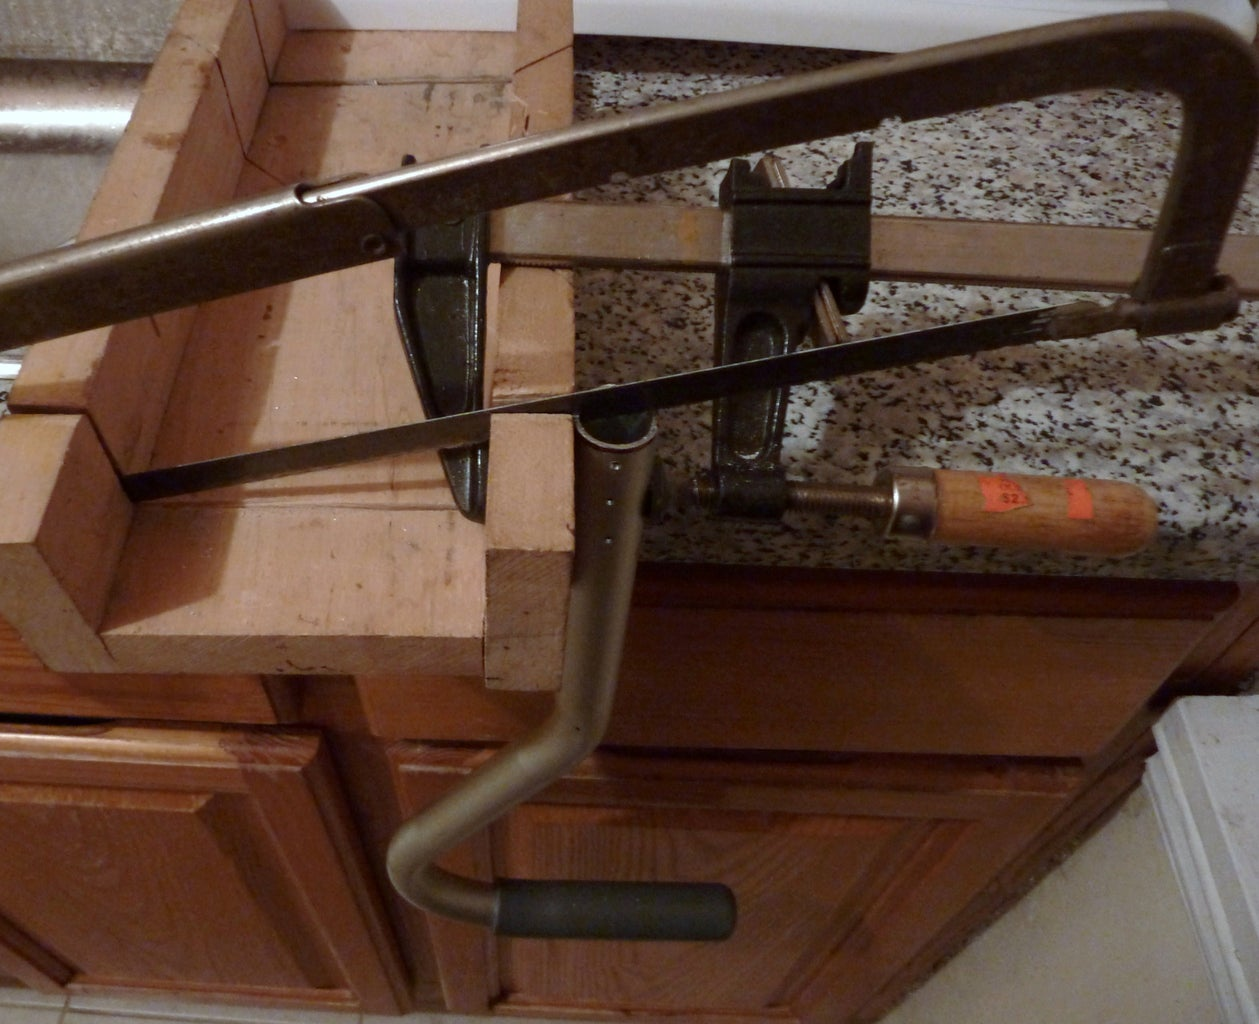 Mark, Drill, Cut  the Aluminum Cane